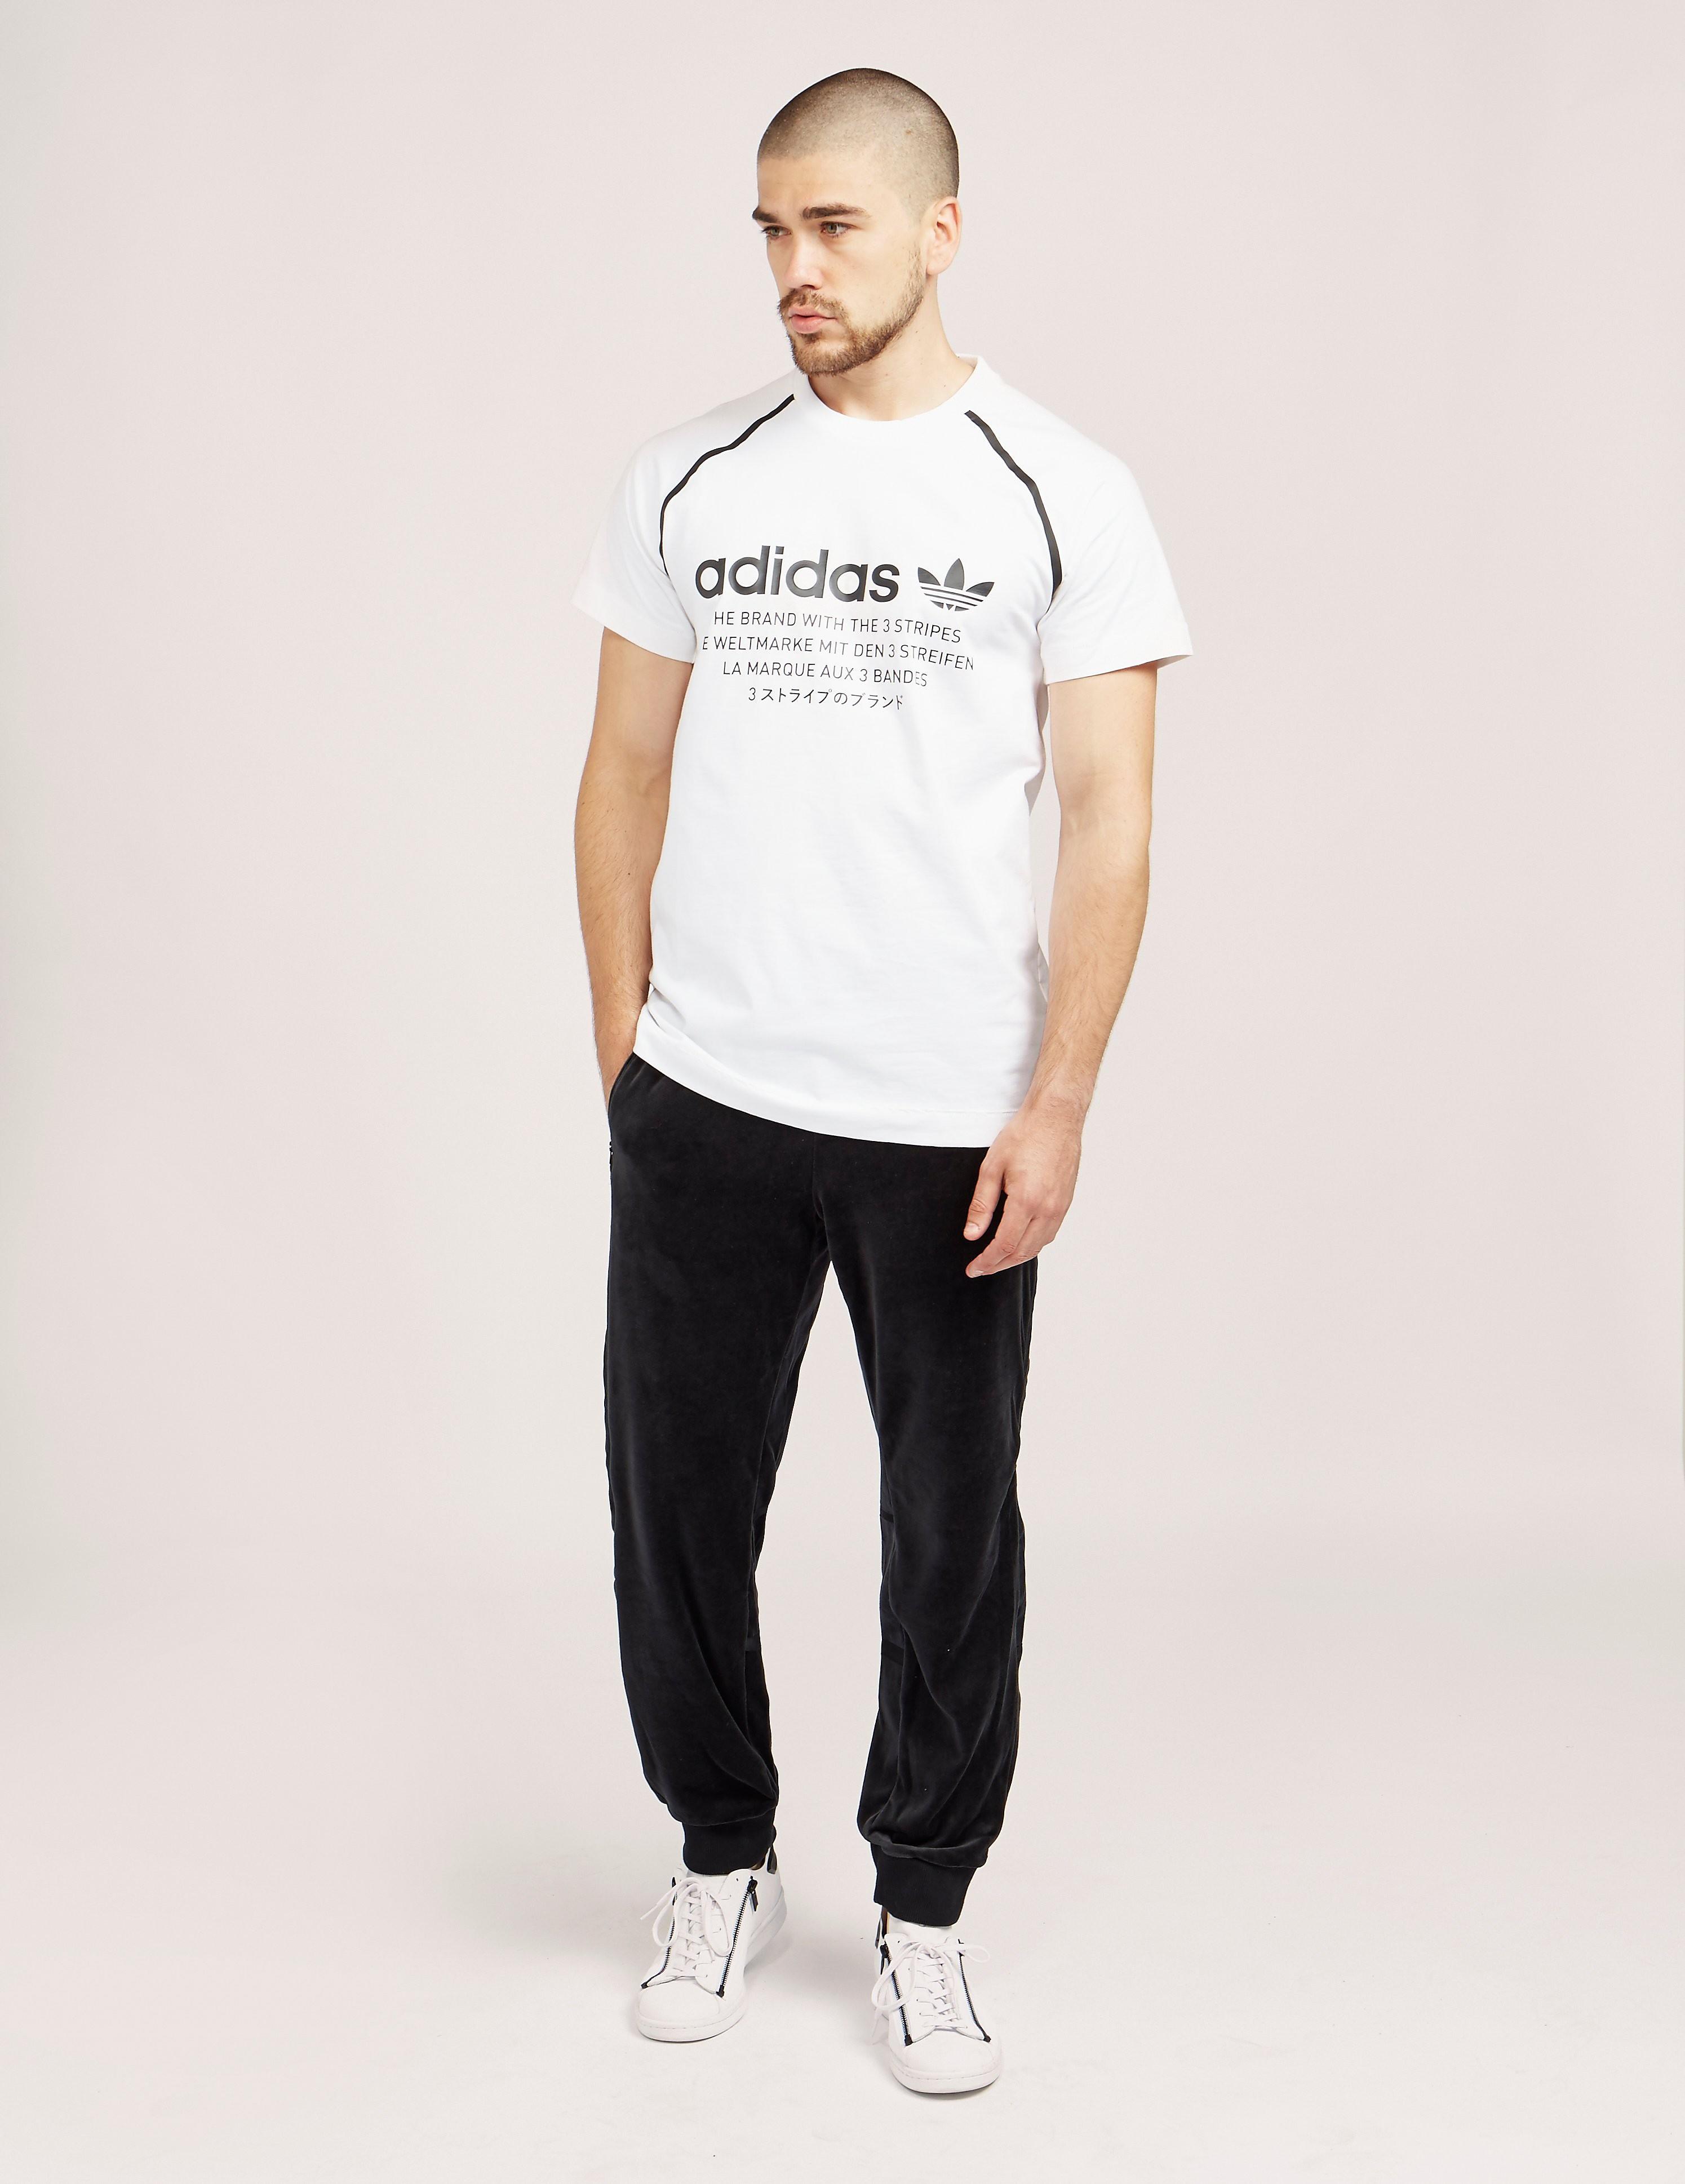 adidas Originals NMD Logo Short Sleeve T-Shirt